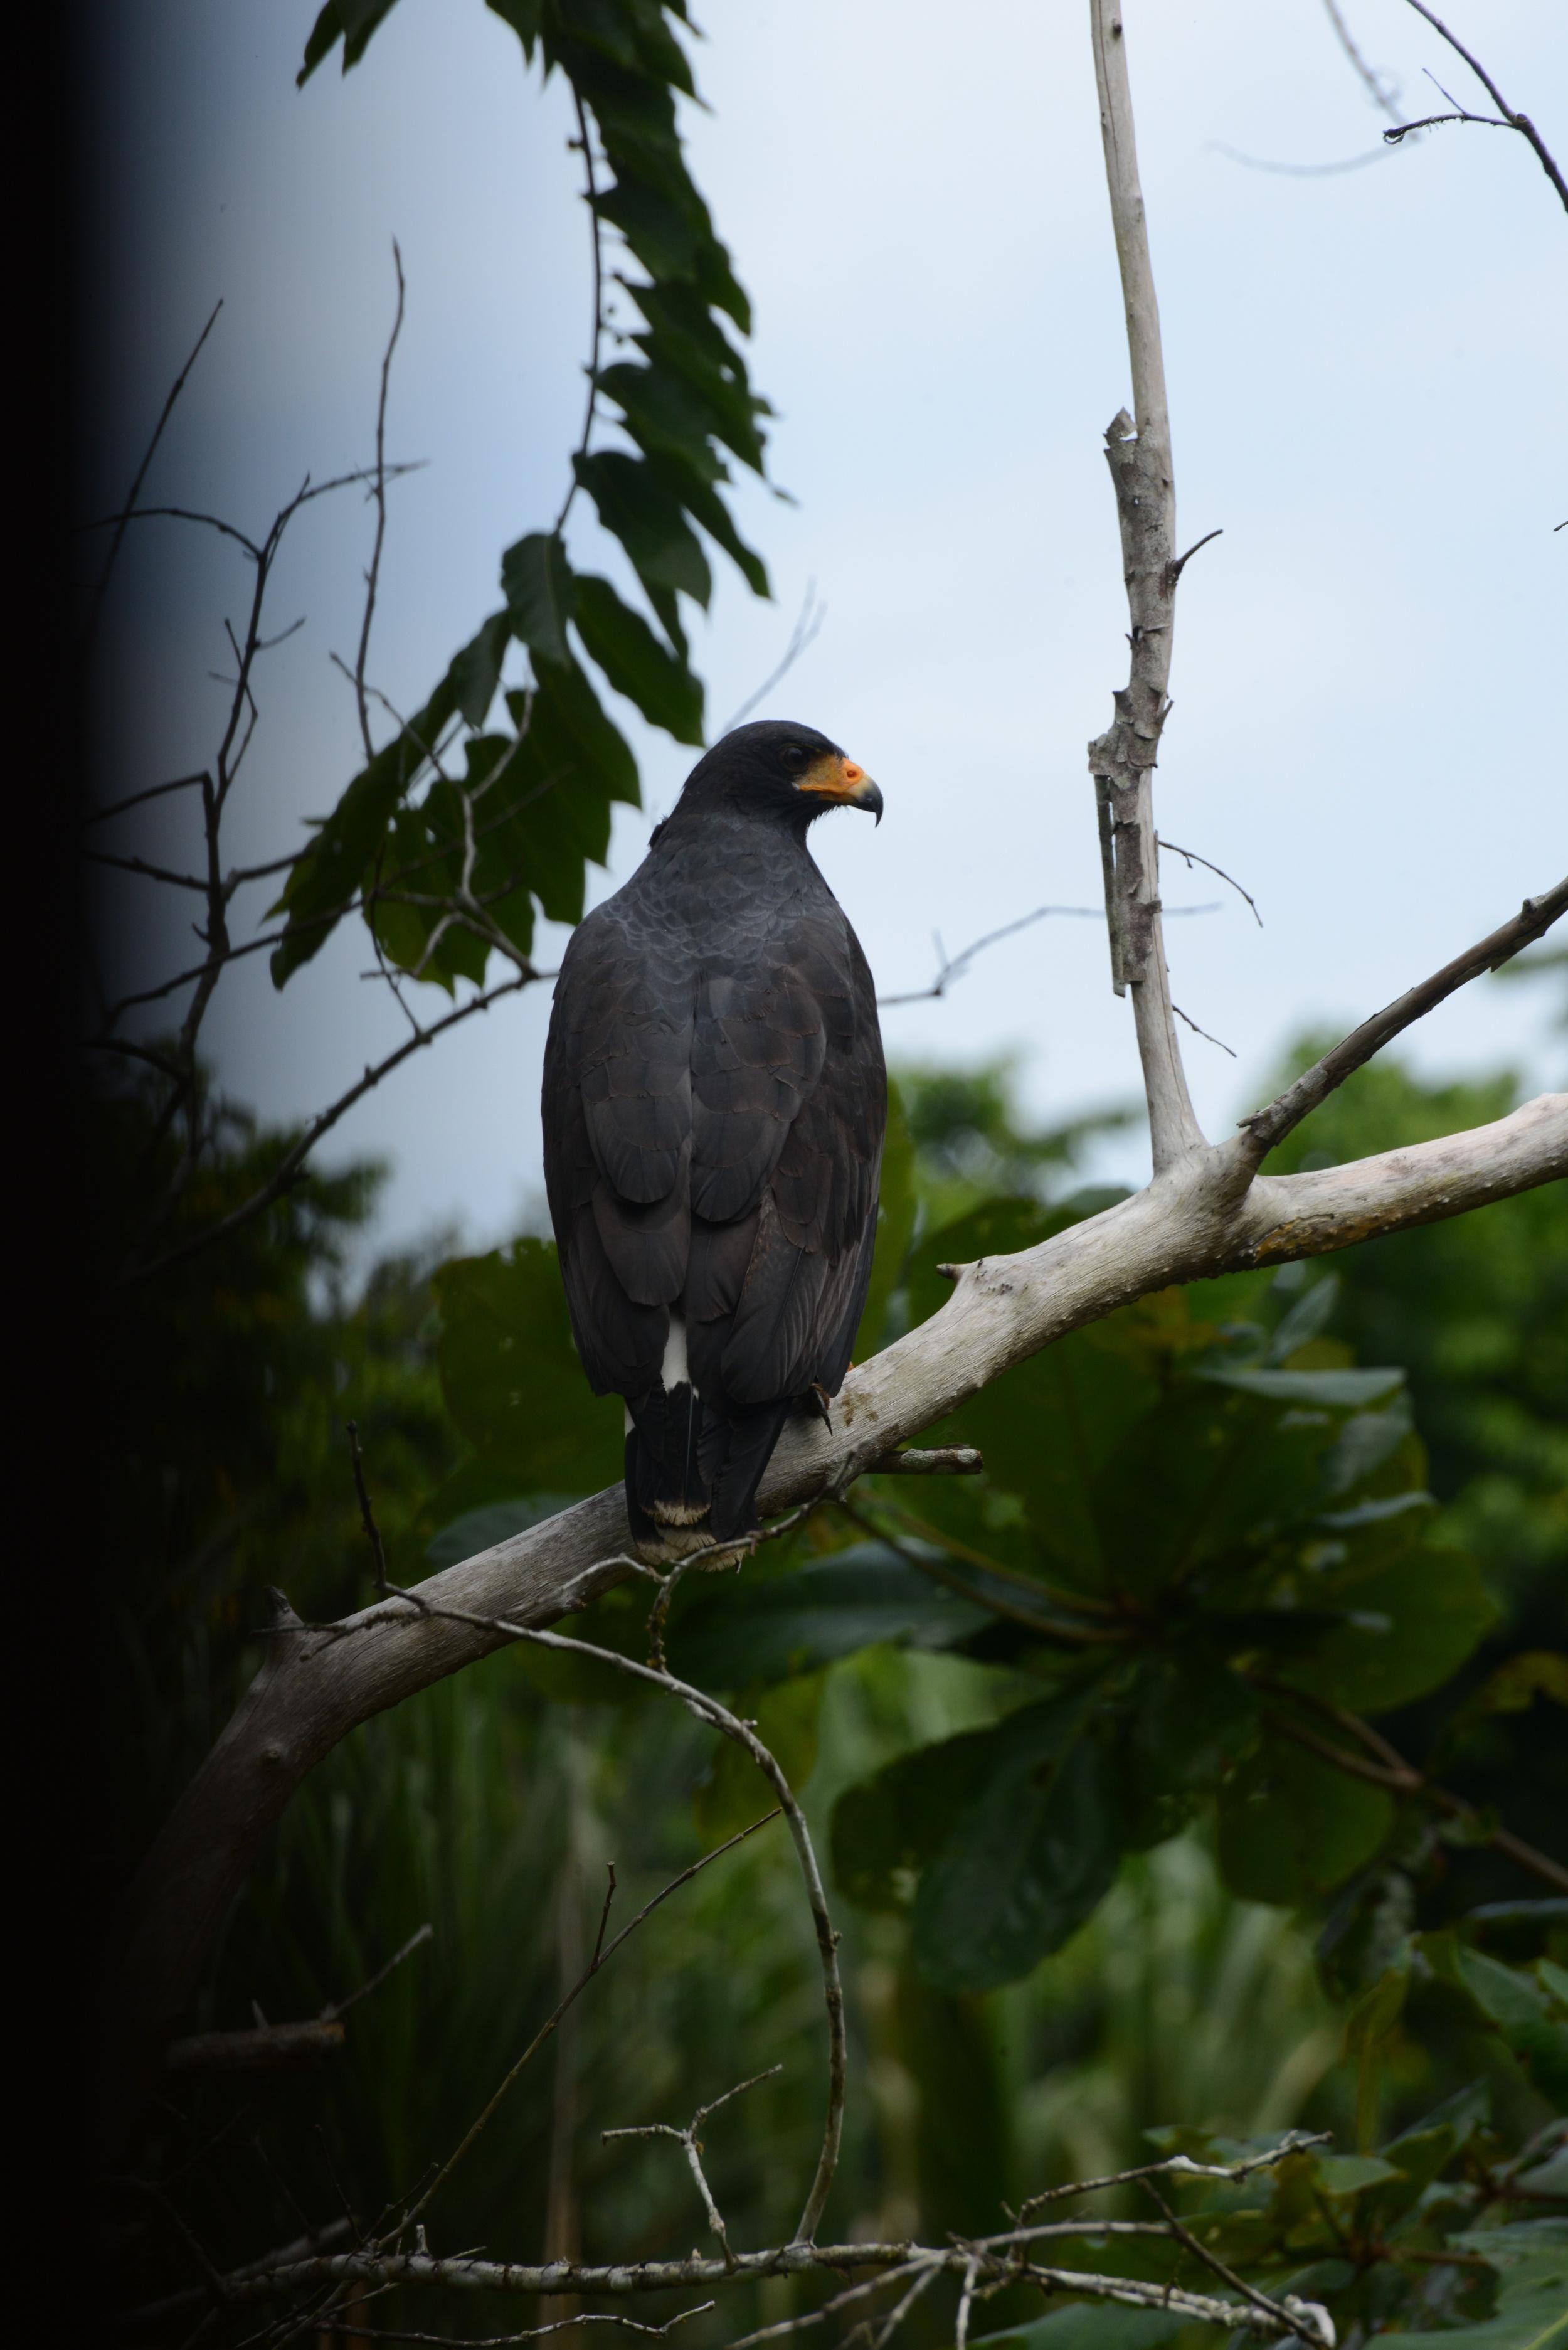 costa rican sparrows - not!